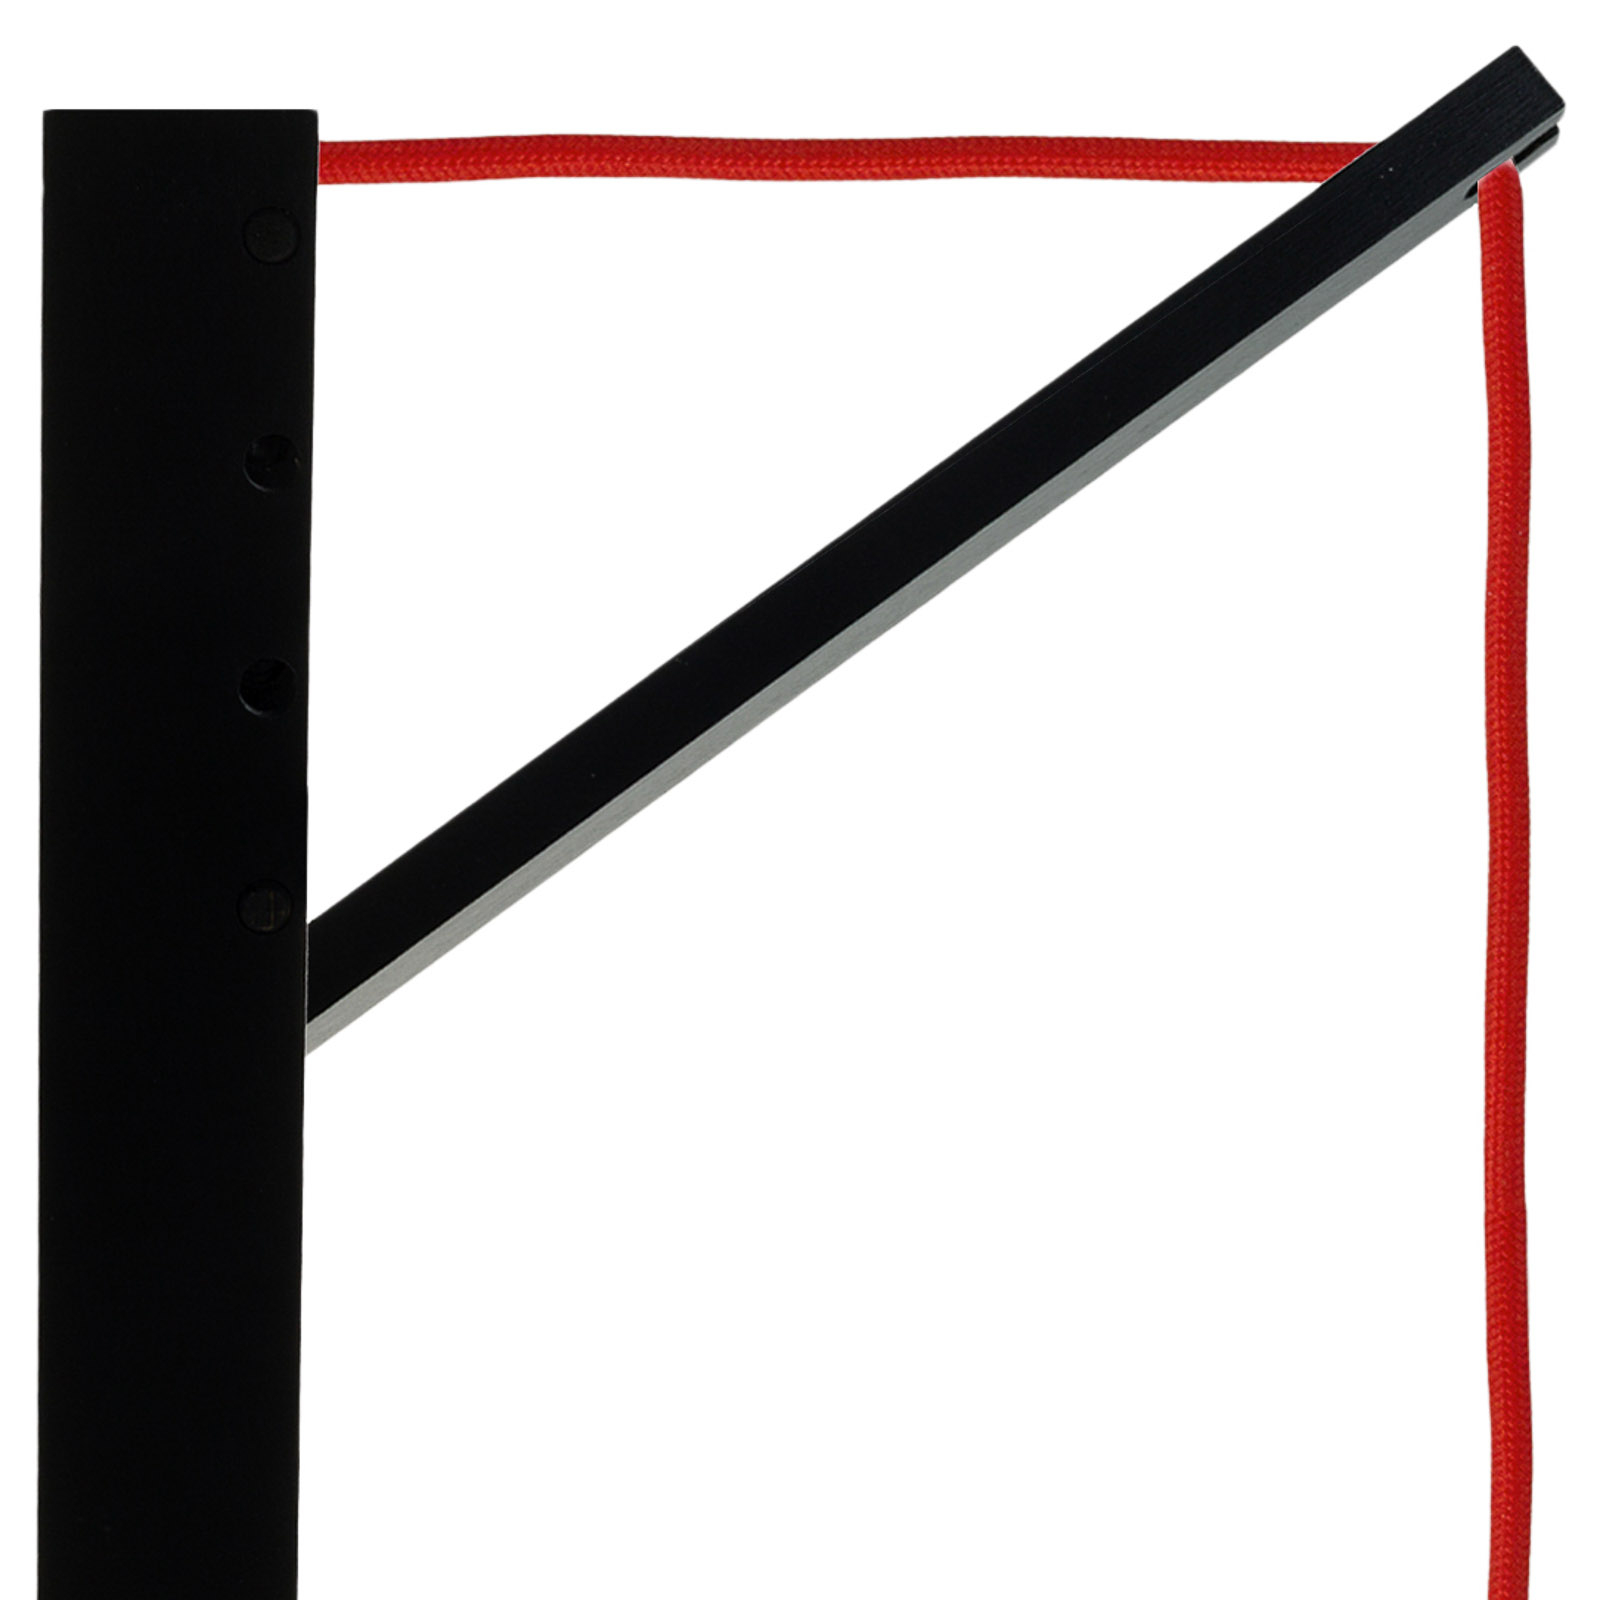 SEGULA Pinocchio seinälamppu musta, punainen johto